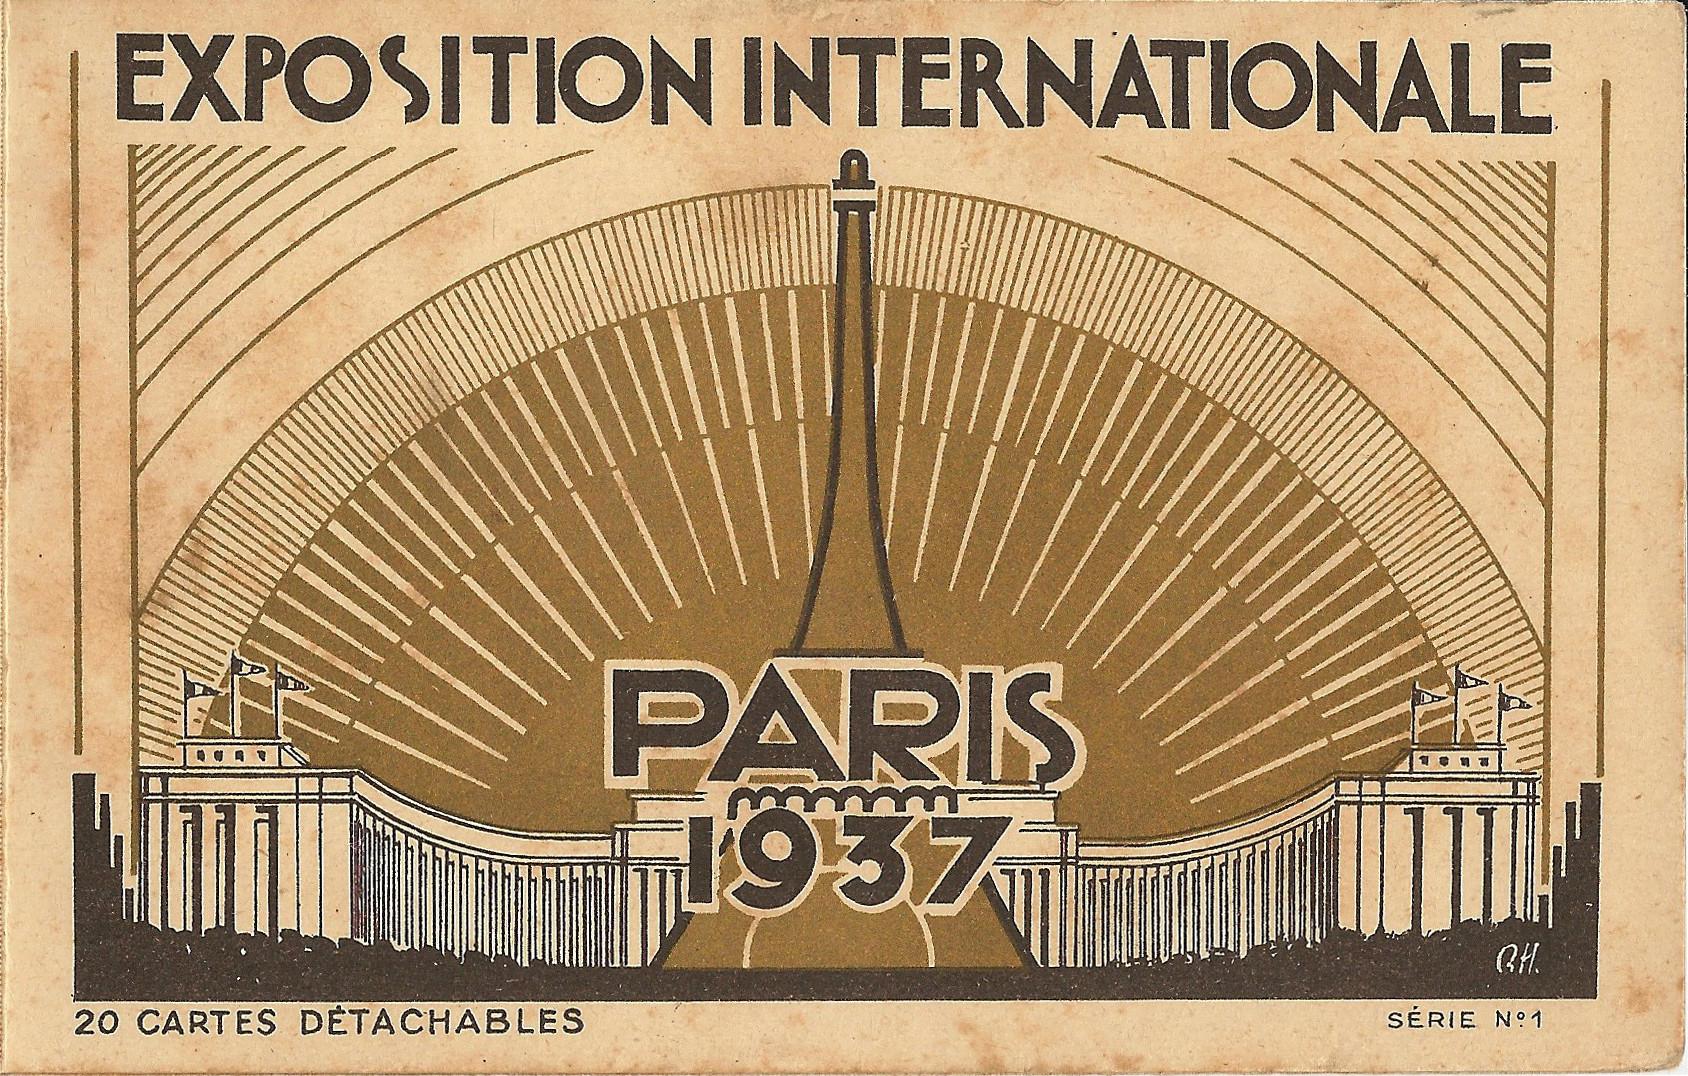 1937 Paris Exposition